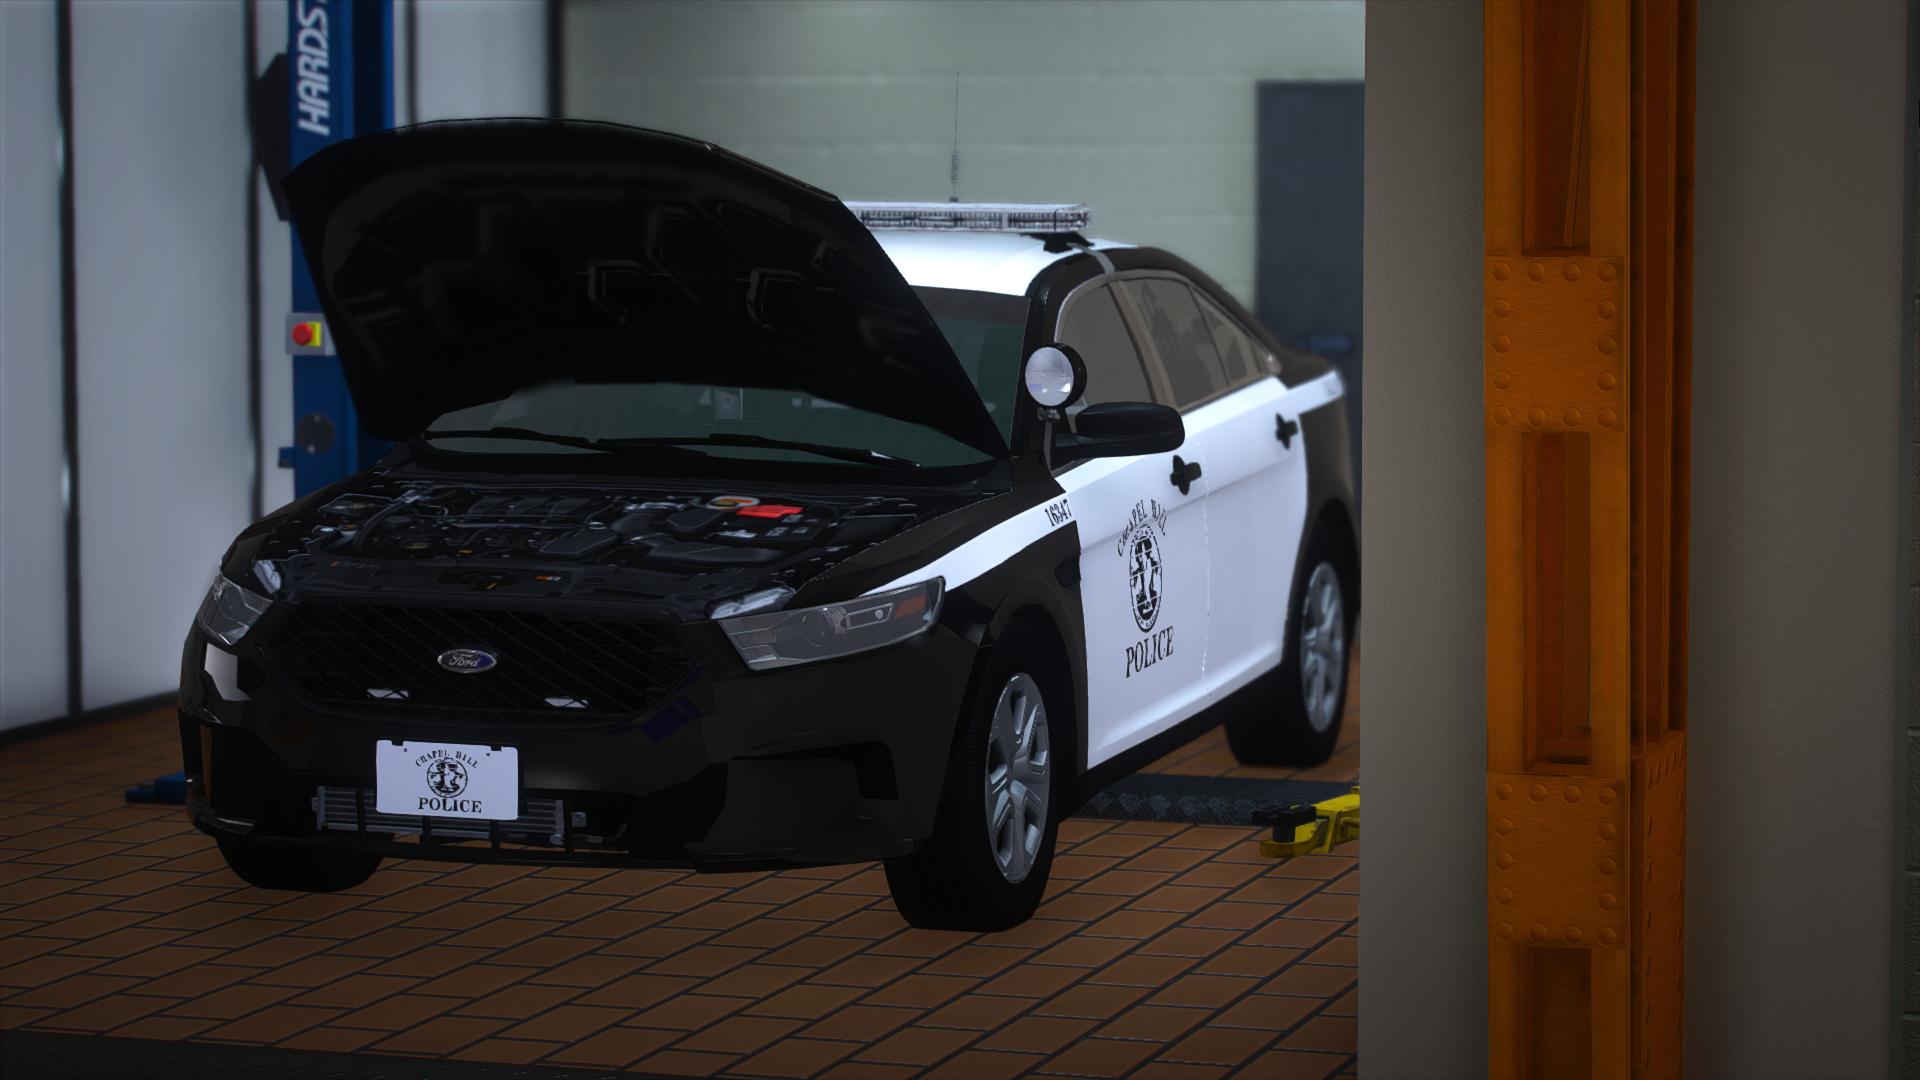 Grand_Theft_Auto_V_Screenshot_2021.08.02_-_04.17.08.35.png